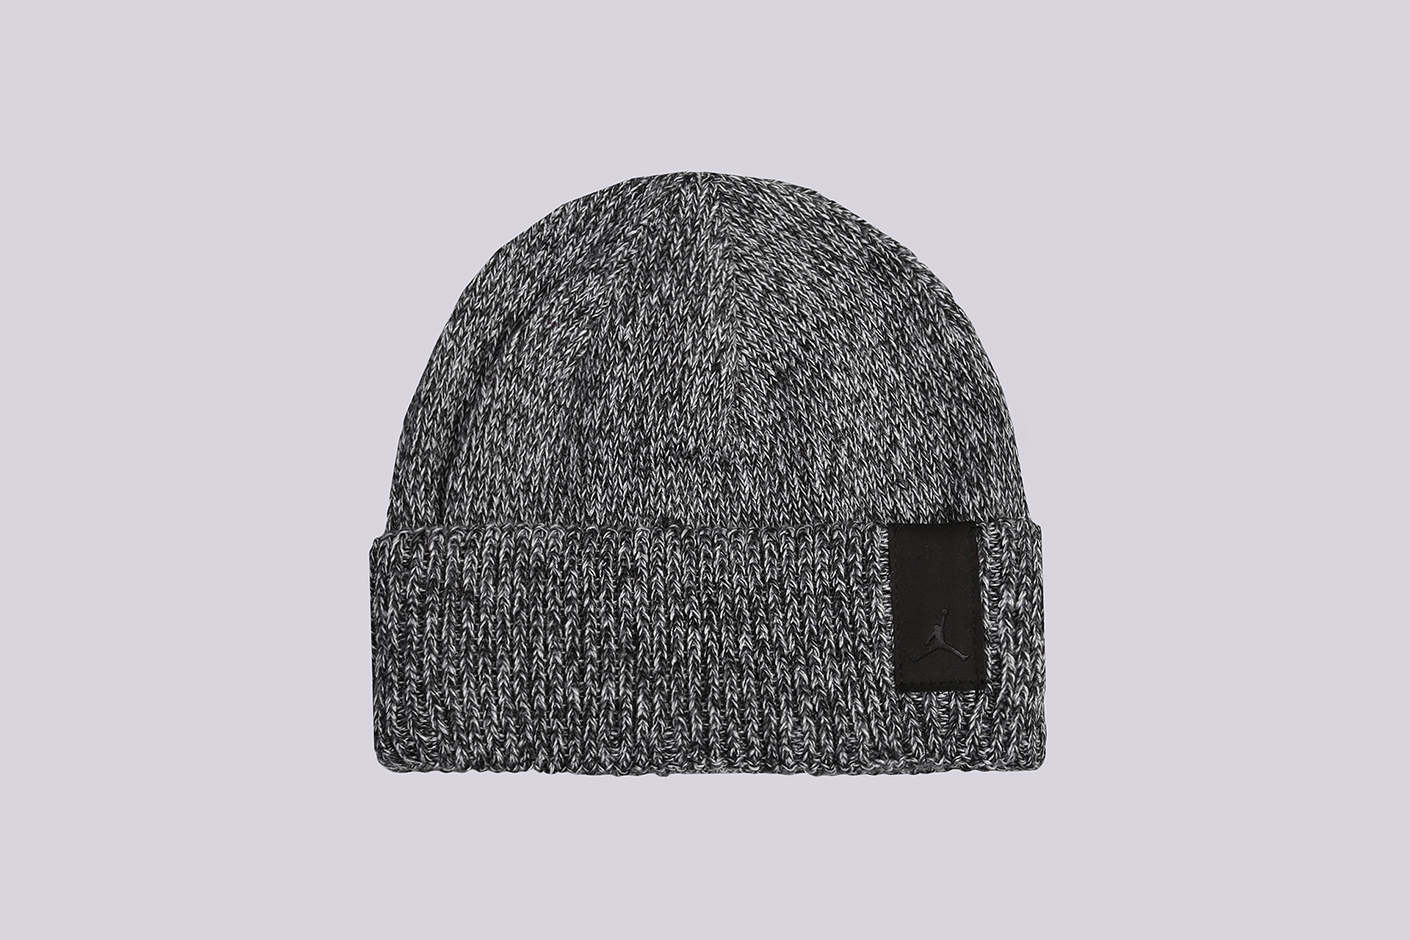 Серая шапка Watch Beanie от Jordan (861456-021) по цене 1430 рублей 751899ed82d